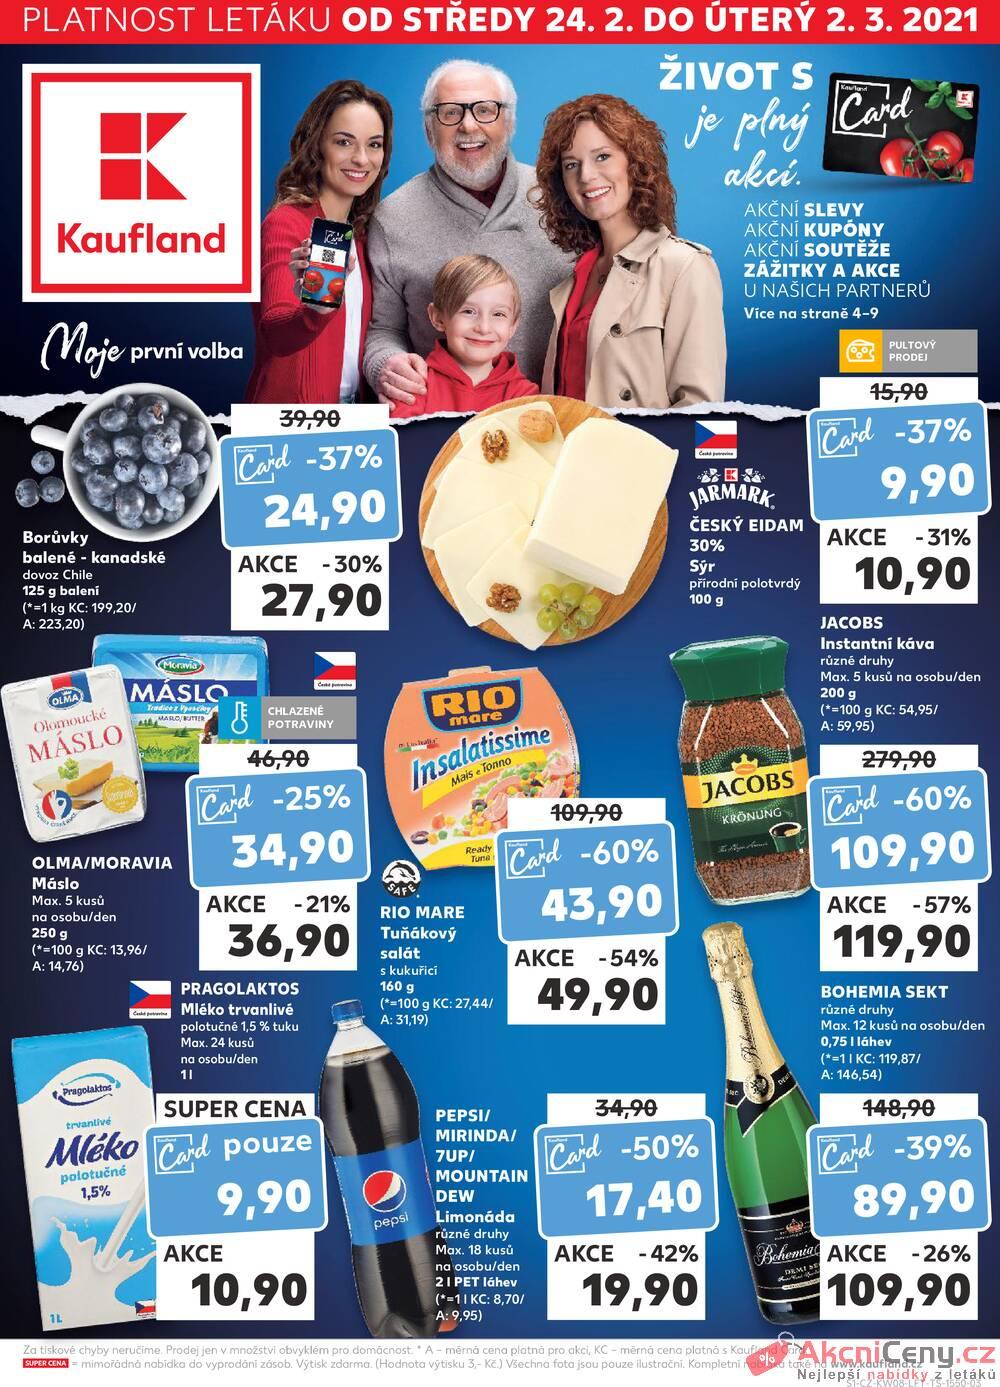 Leták Kaufland - Kaufland 24.2. - 2.3. - Kaufland - Ostrava - Zábřeh - strana 1